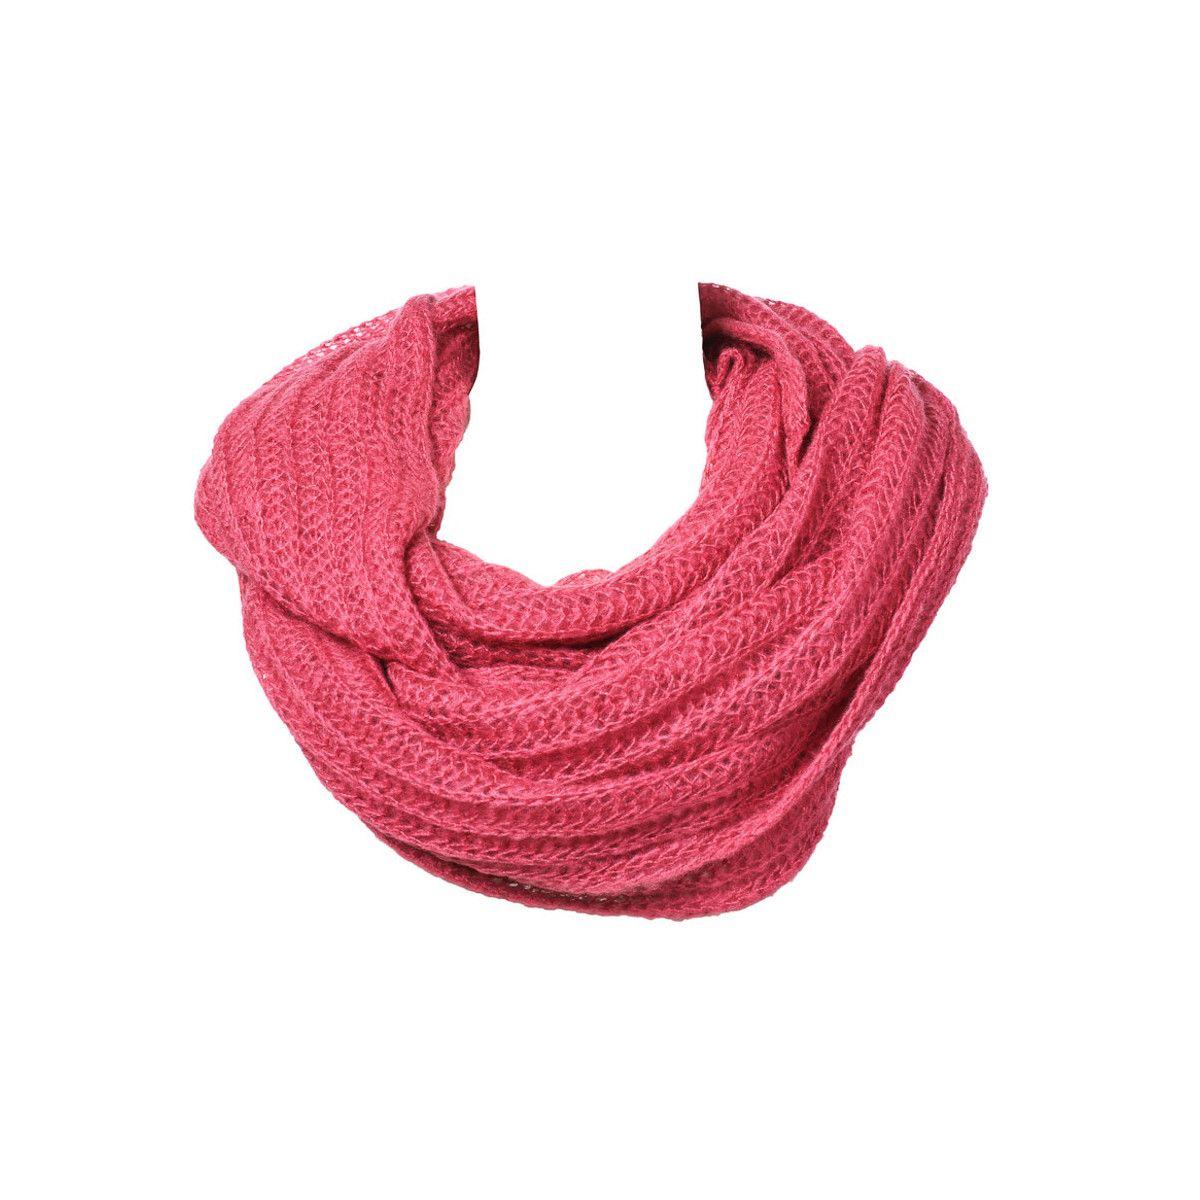 Grand snood tour de cou laine rose framboise